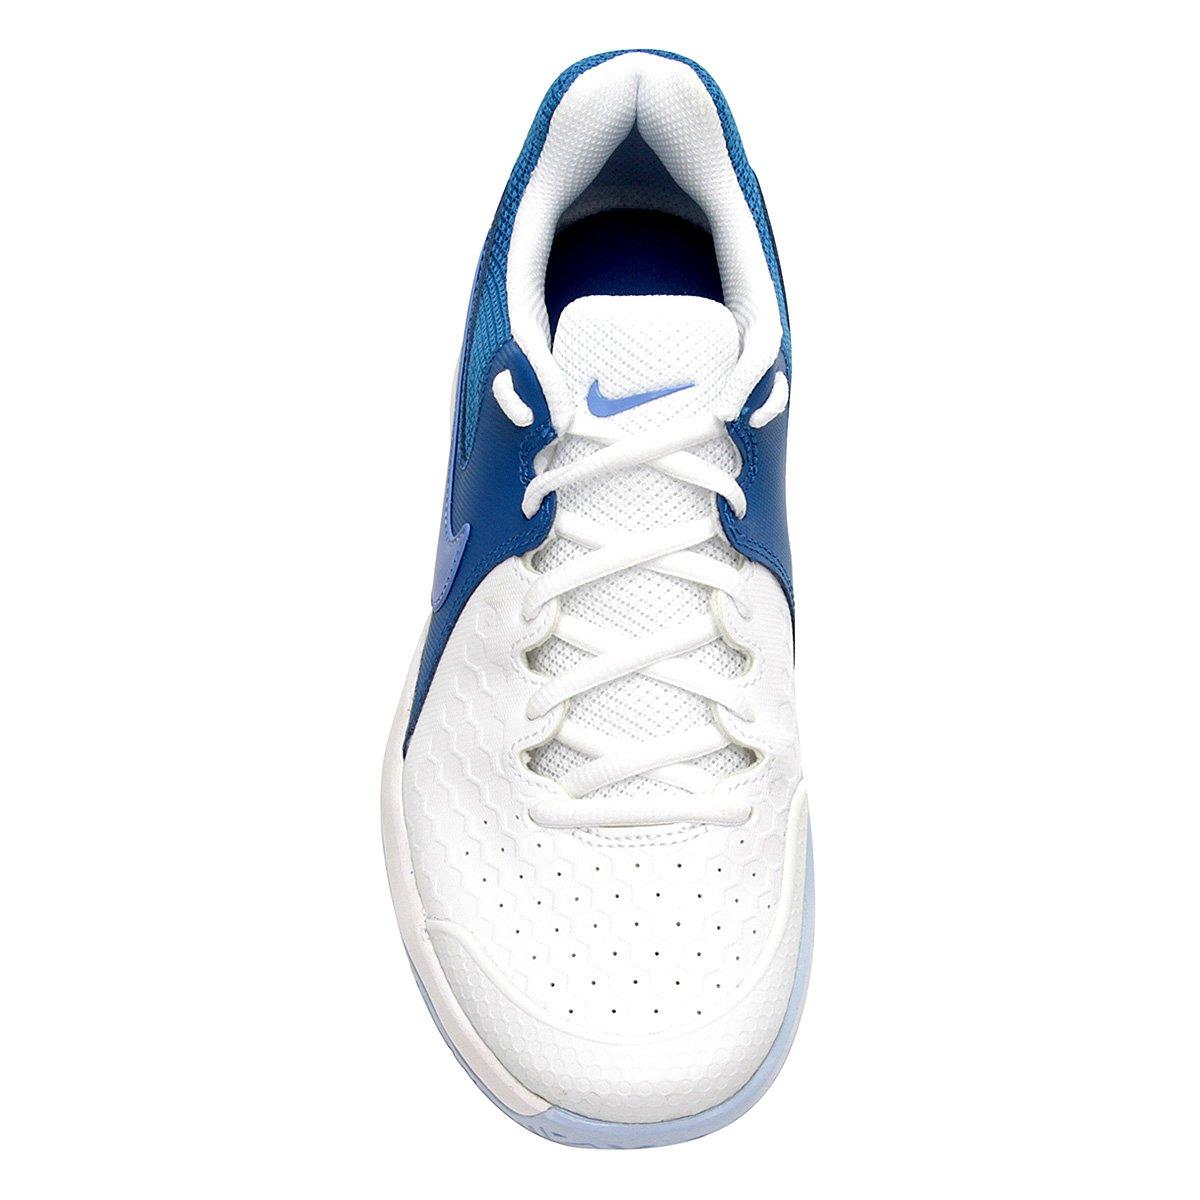 Branco e Feminina Azul Claro Zoom Resistance Tênis Nike Air Y7wXqTTR